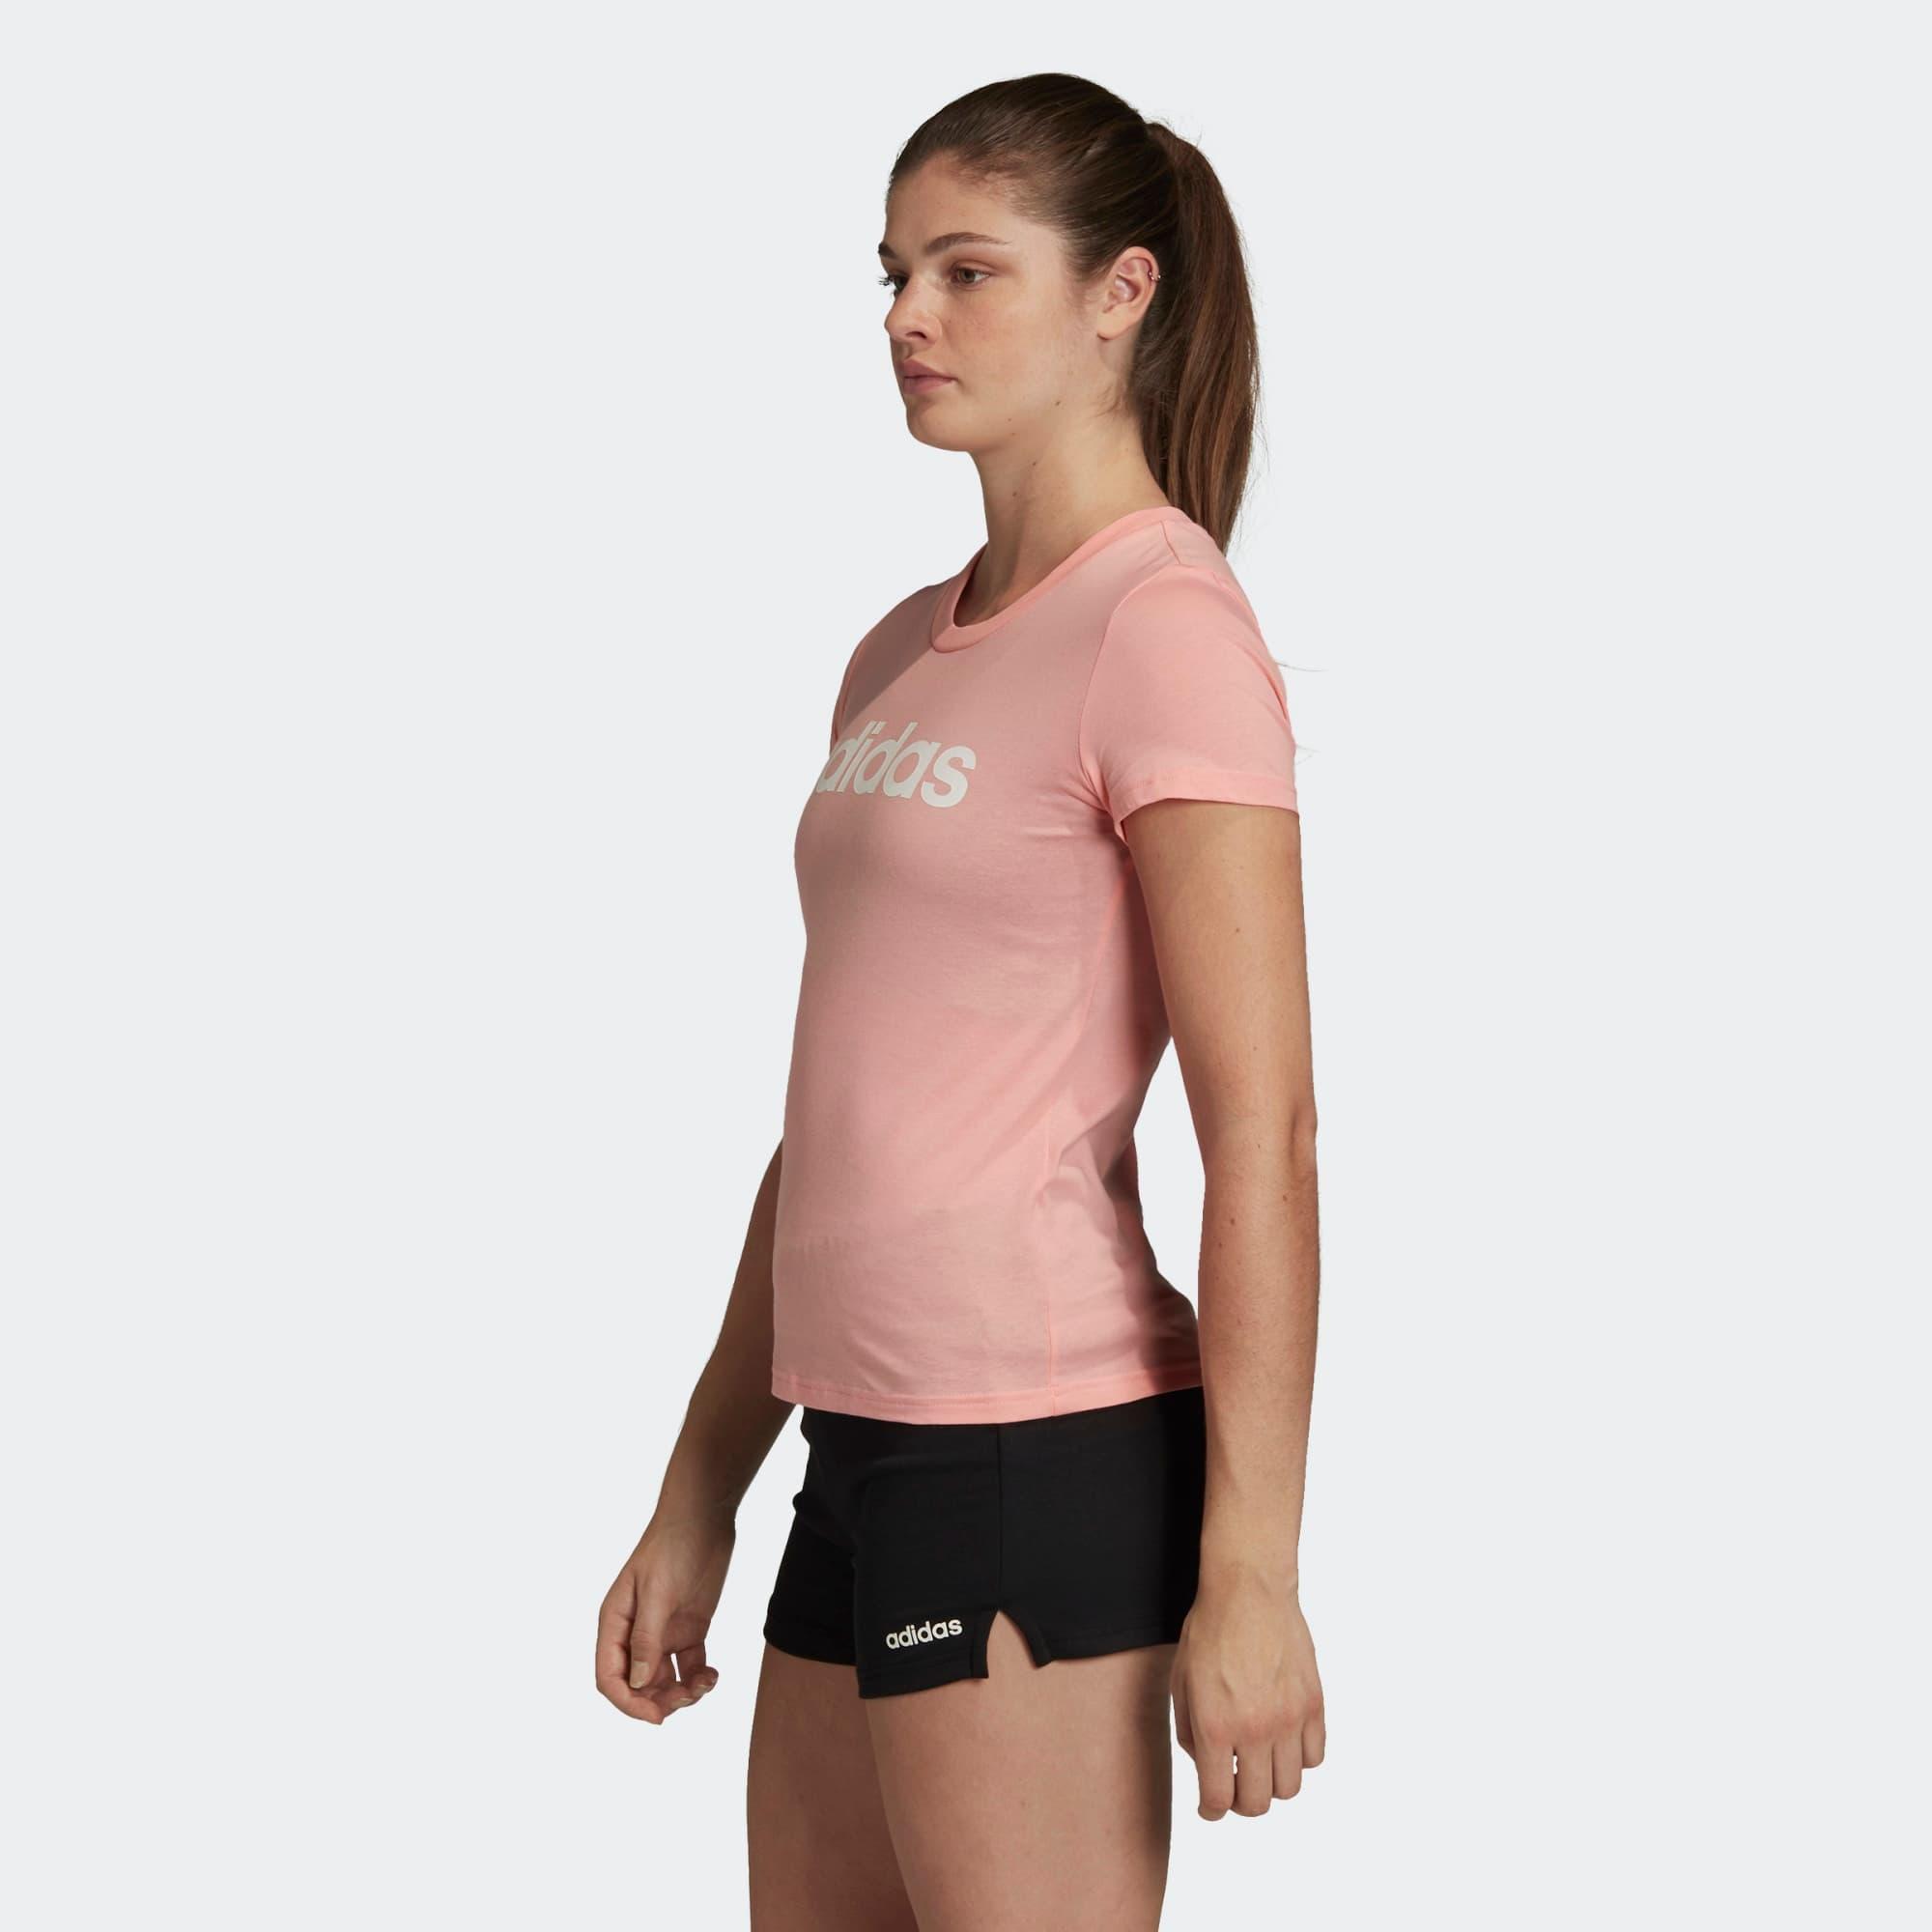 Essentials Linear Kadın Pembe Spor Tişört (fm6423)